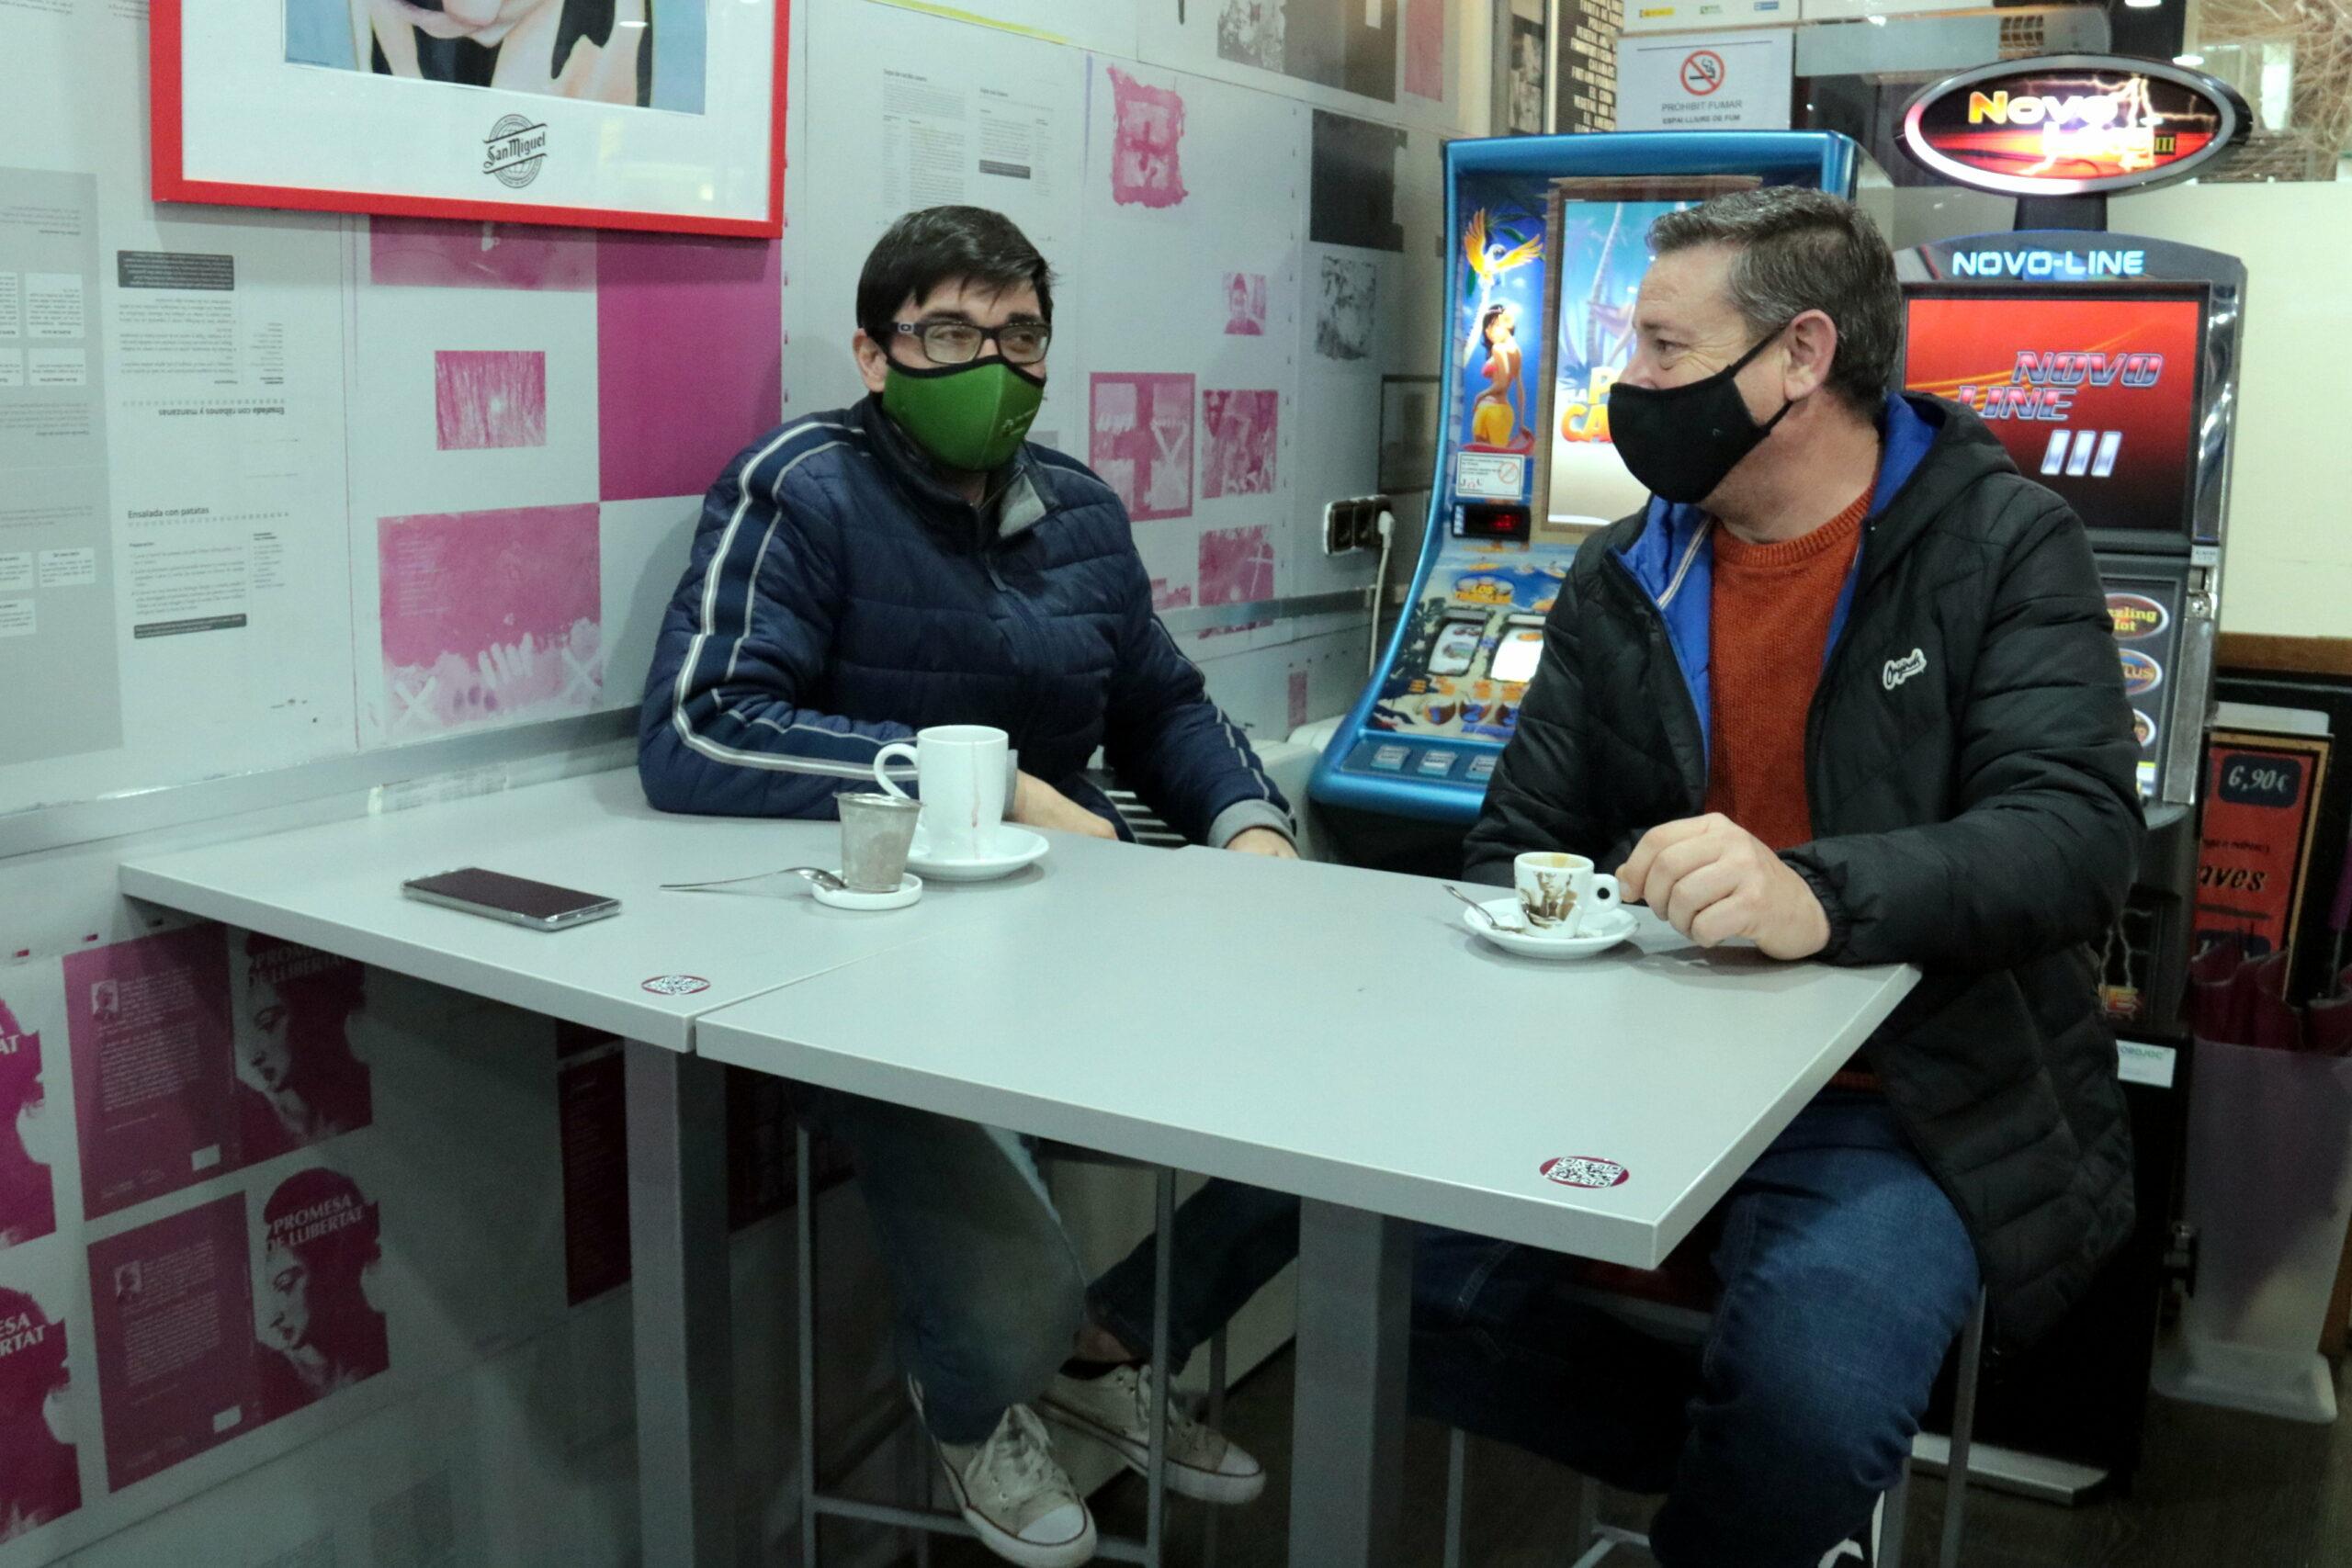 Dos clients d'una cafeteria de la Zona Alta de Lleida | ACN